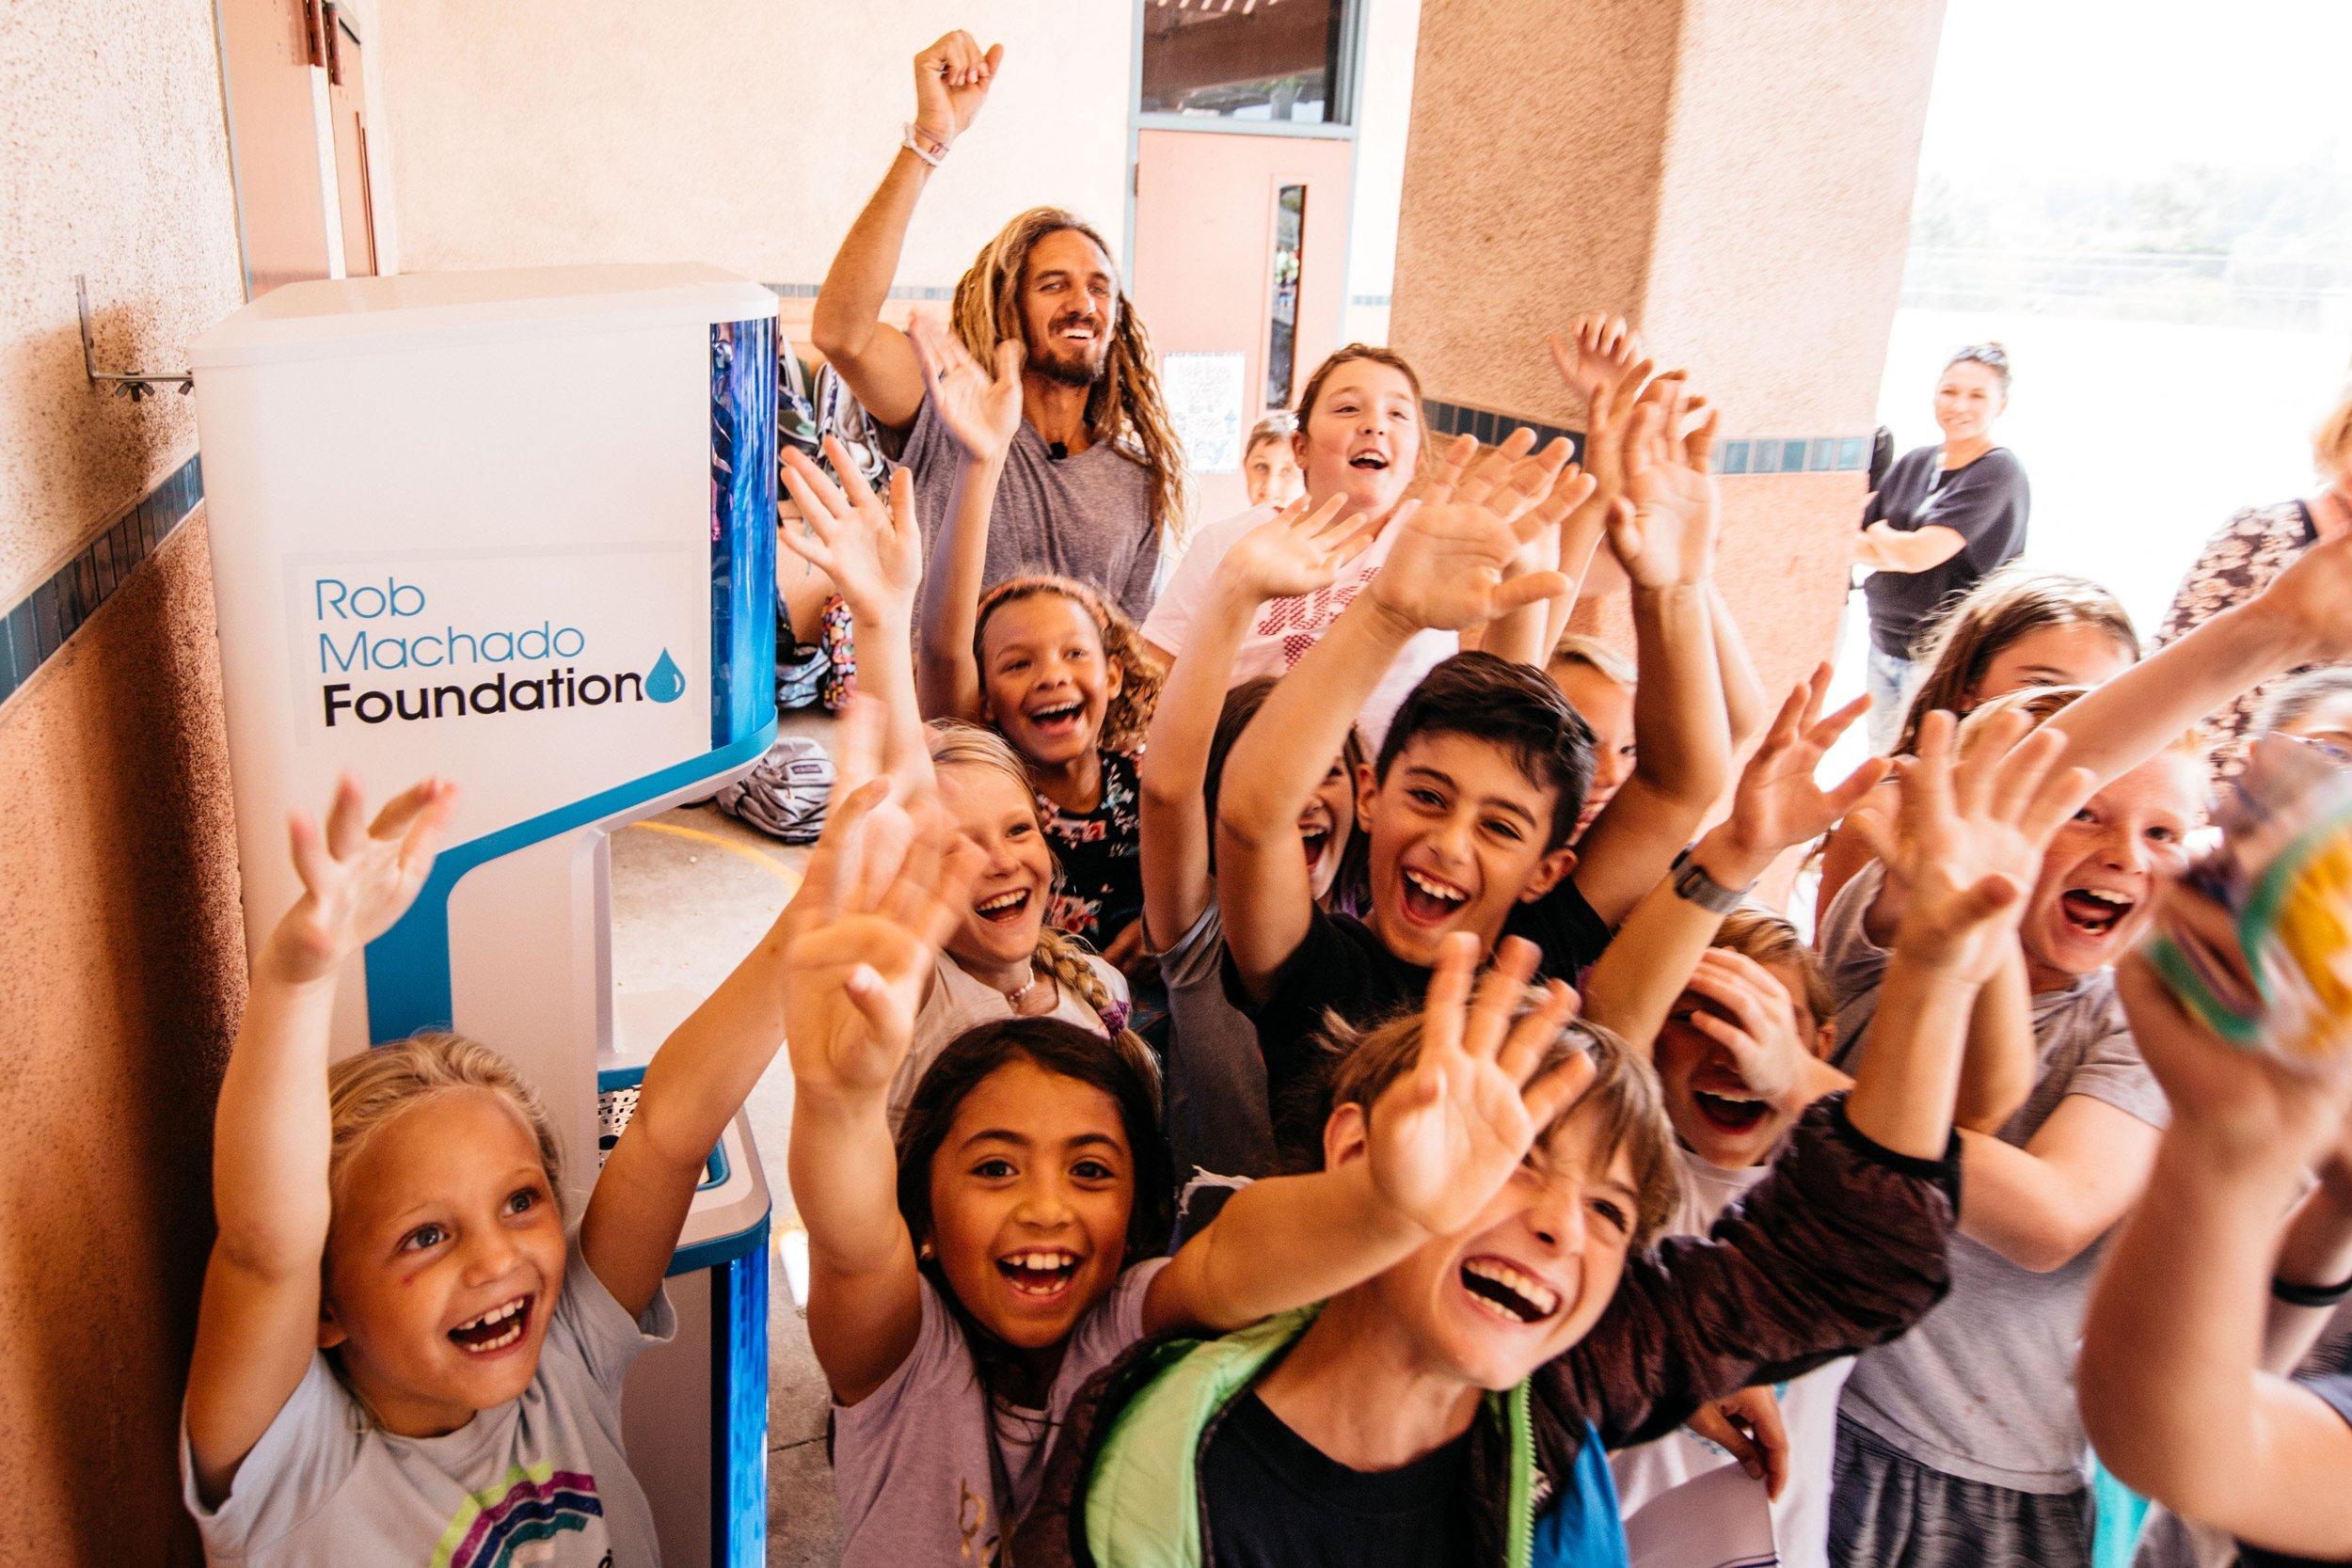 RMF_CarlsbadSchool_epikblue_kidsjumping.jpg